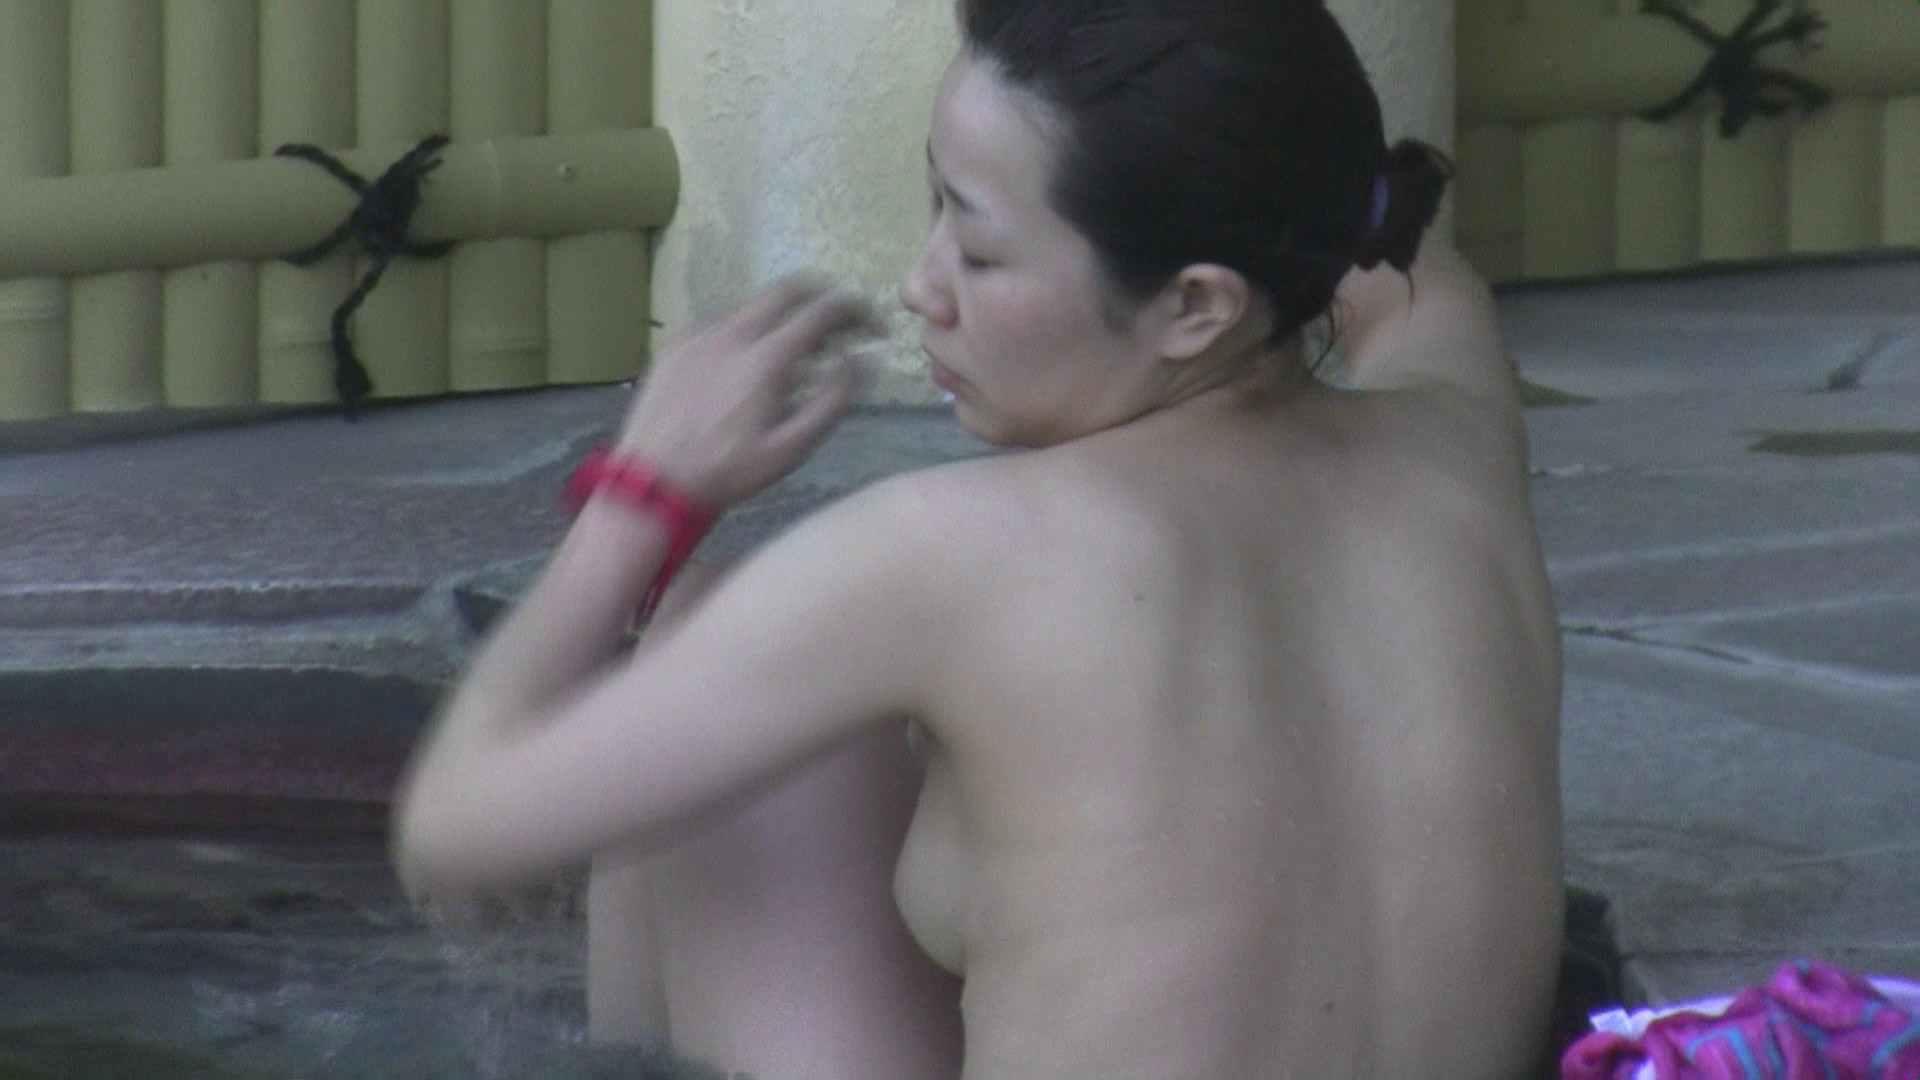 Aquaな露天風呂Vol.88【VIP限定】 綺麗なOLたち  57枚 27